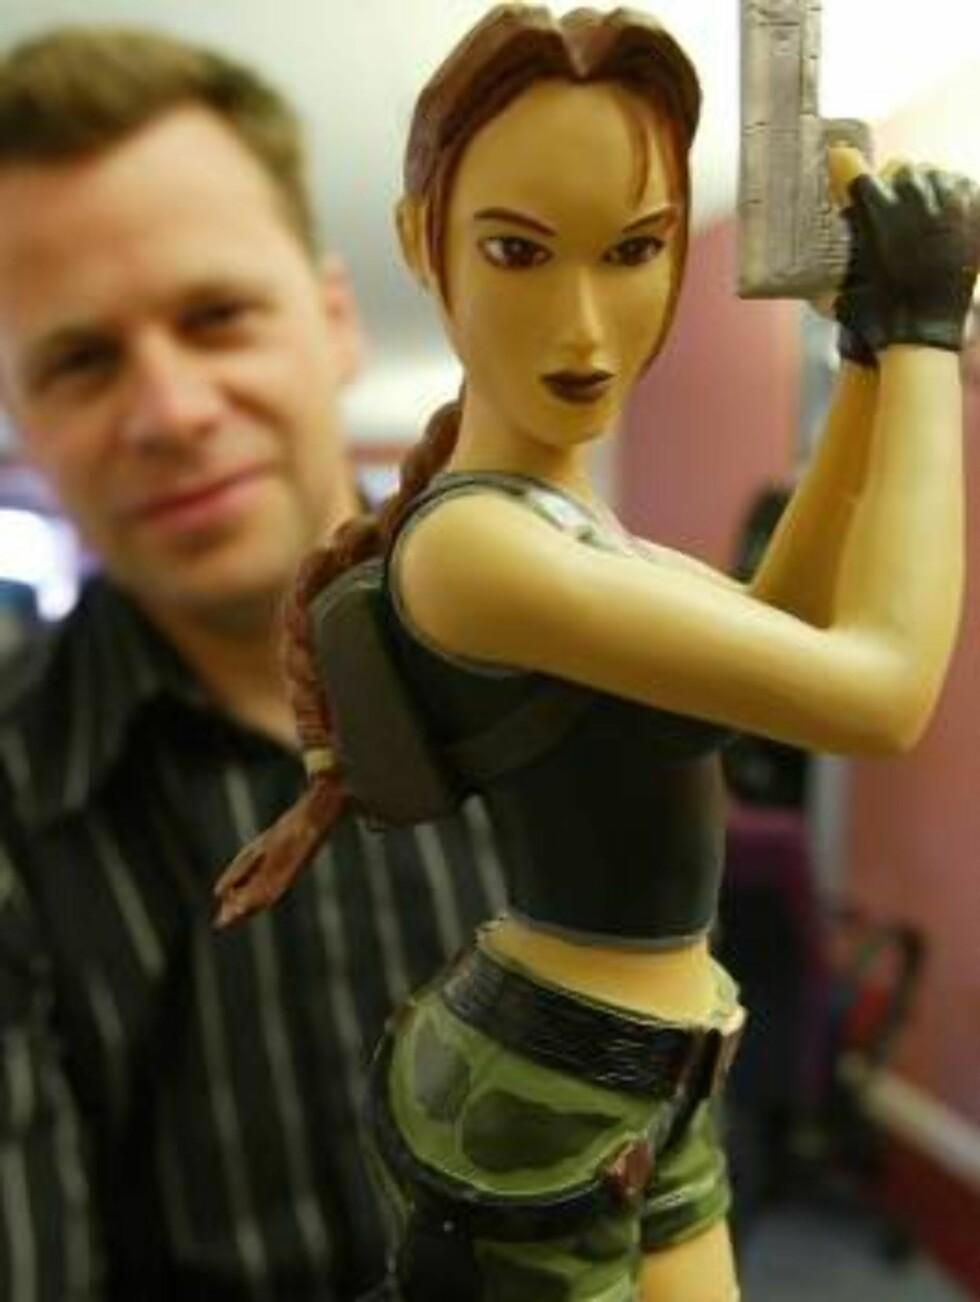 NUMMER SEKS: Lara Croft Foto: SCANPIX